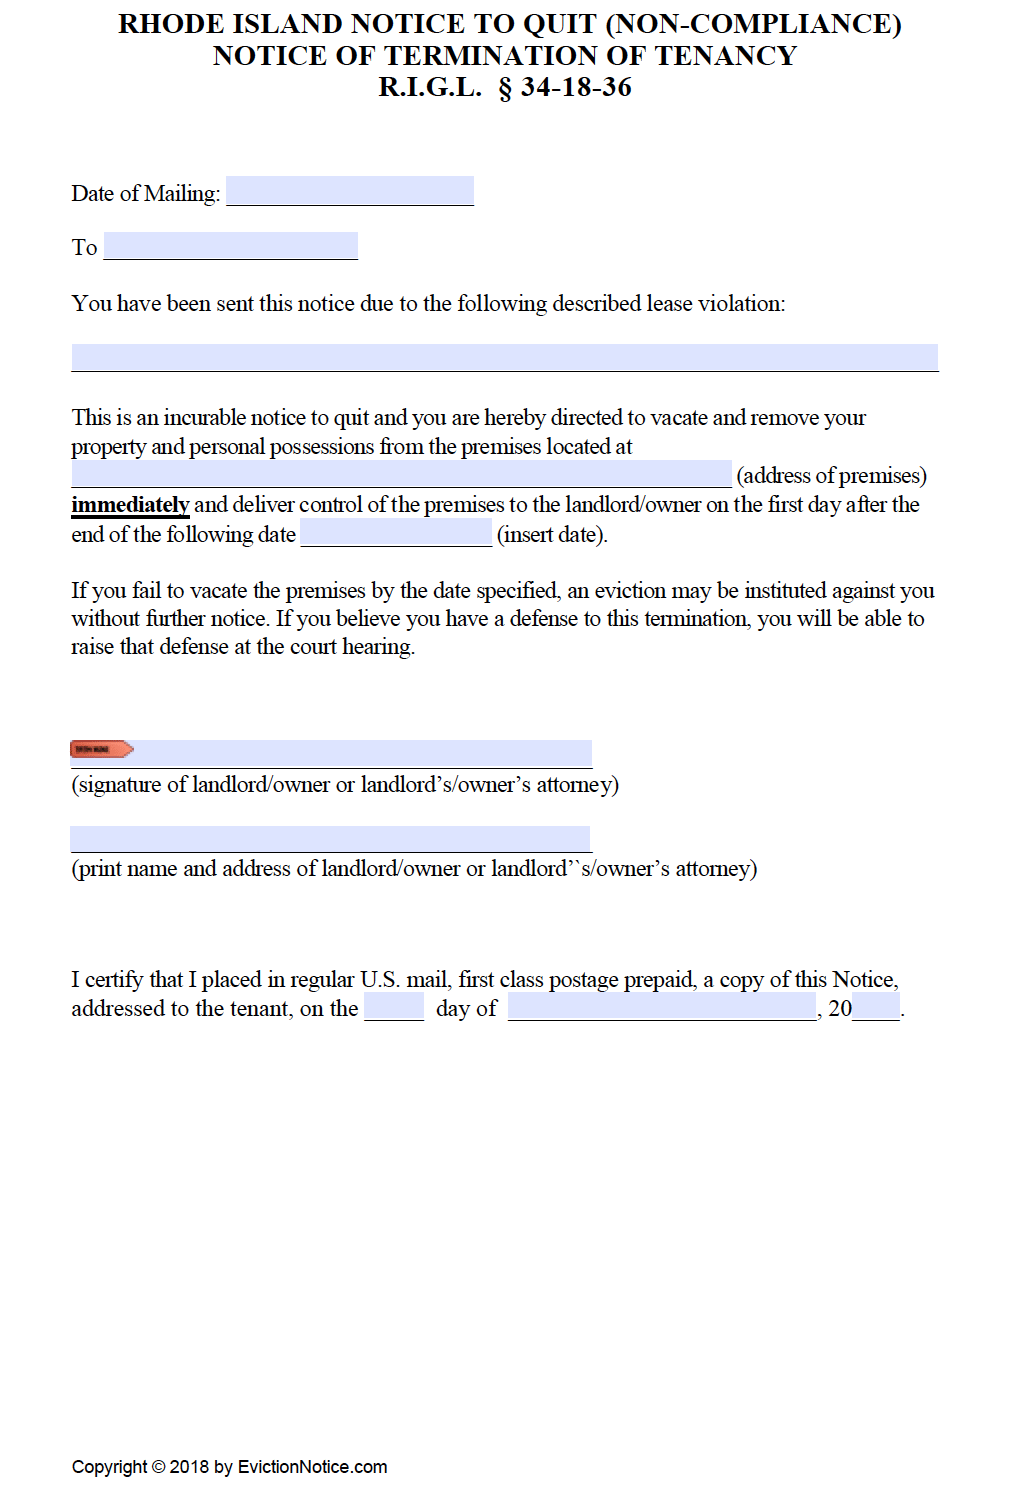 free rhode island immediate notice to quit pdf